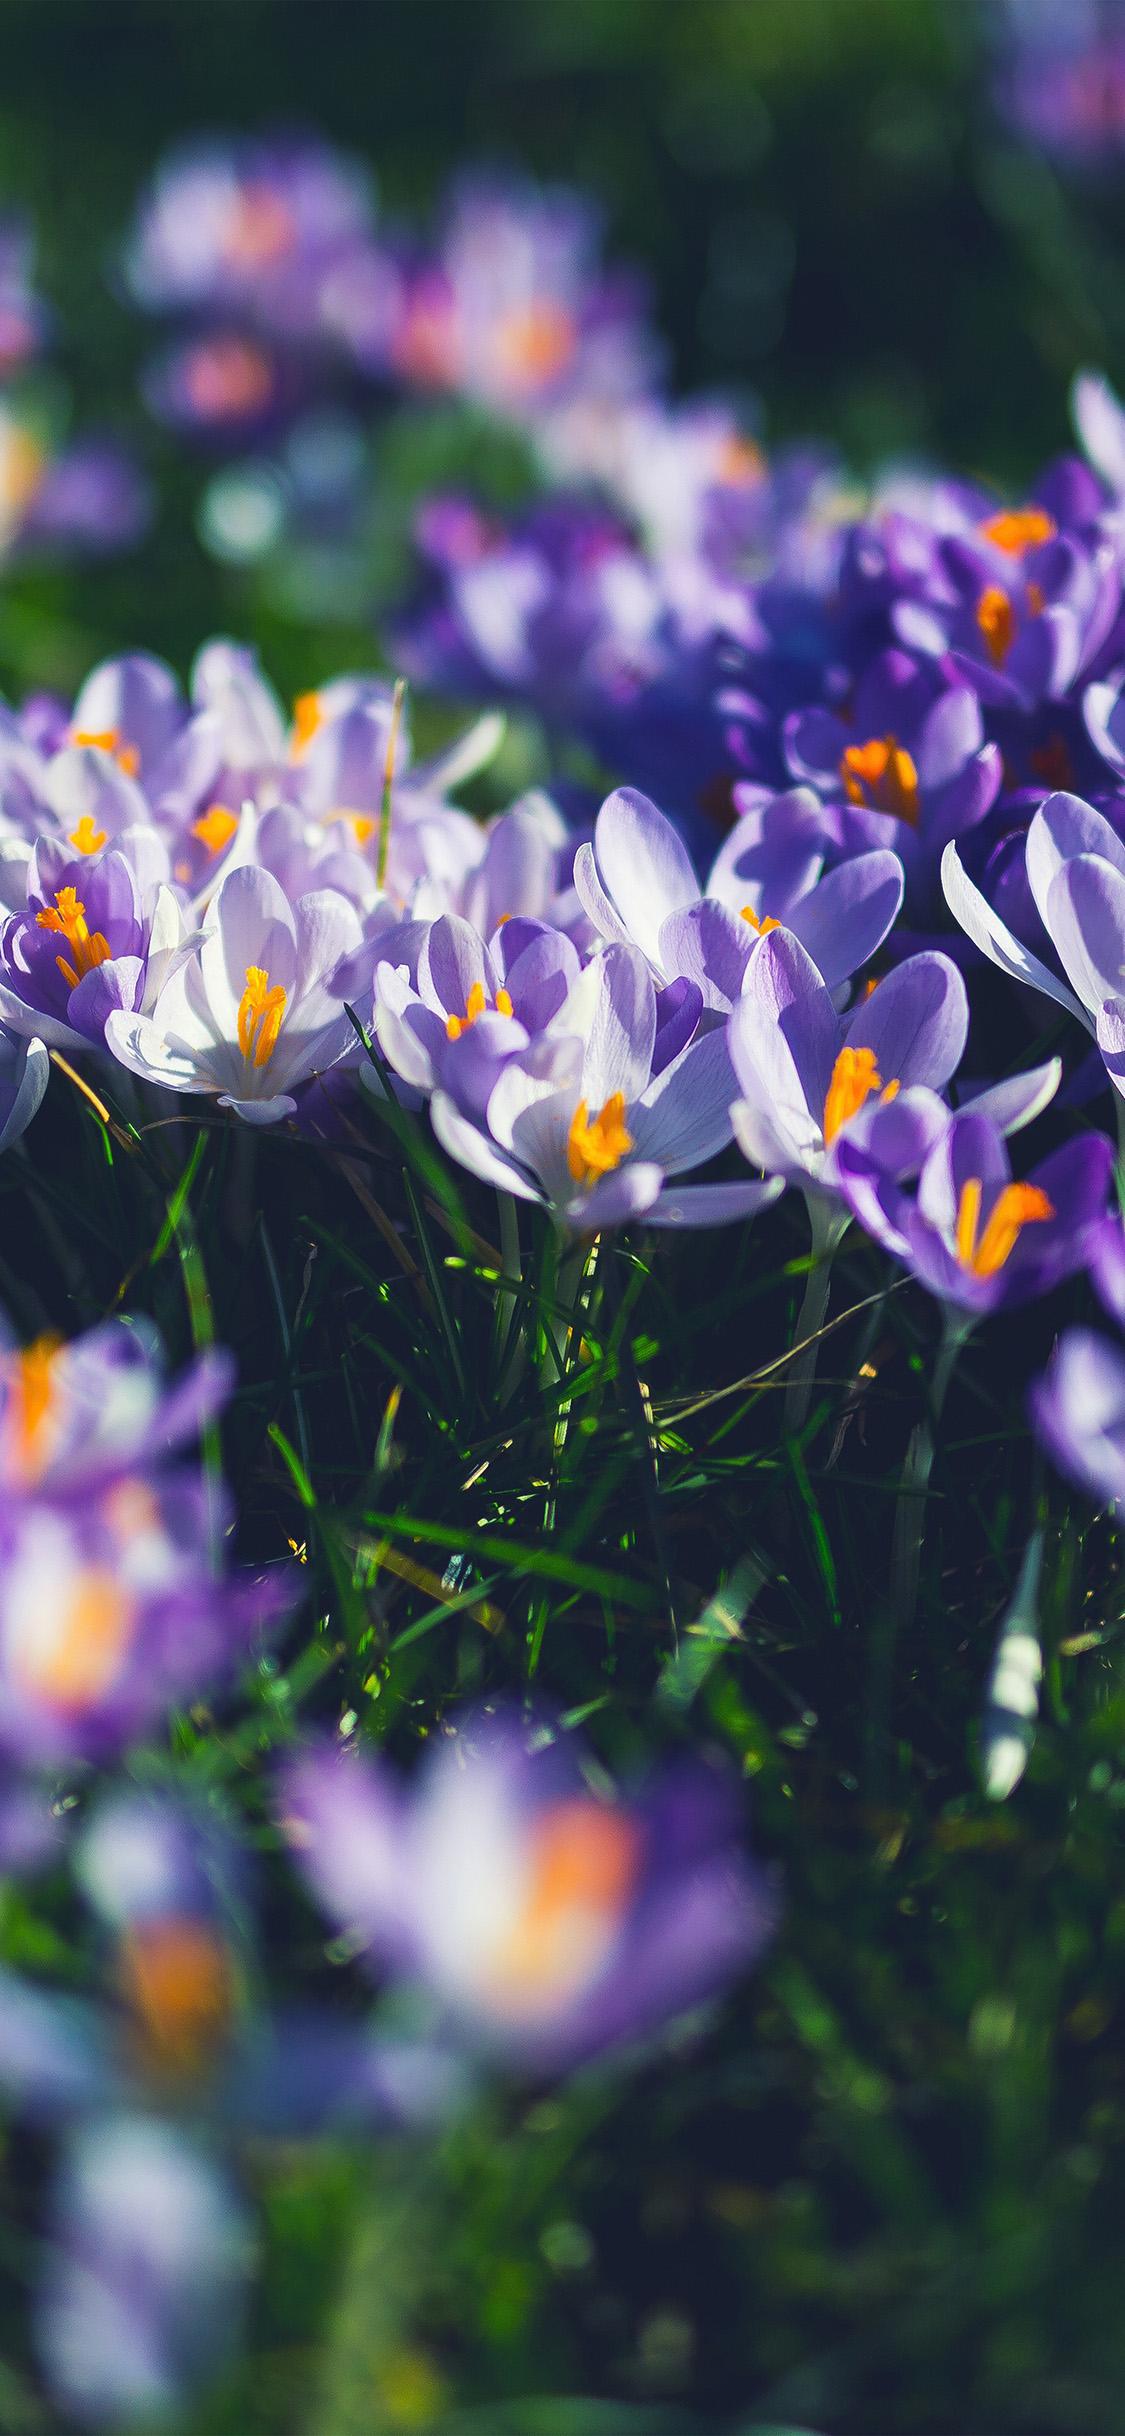 Cute Butterfly Wallpaper Hd Nw04 Flower Purple Spring Nature Wallpaper